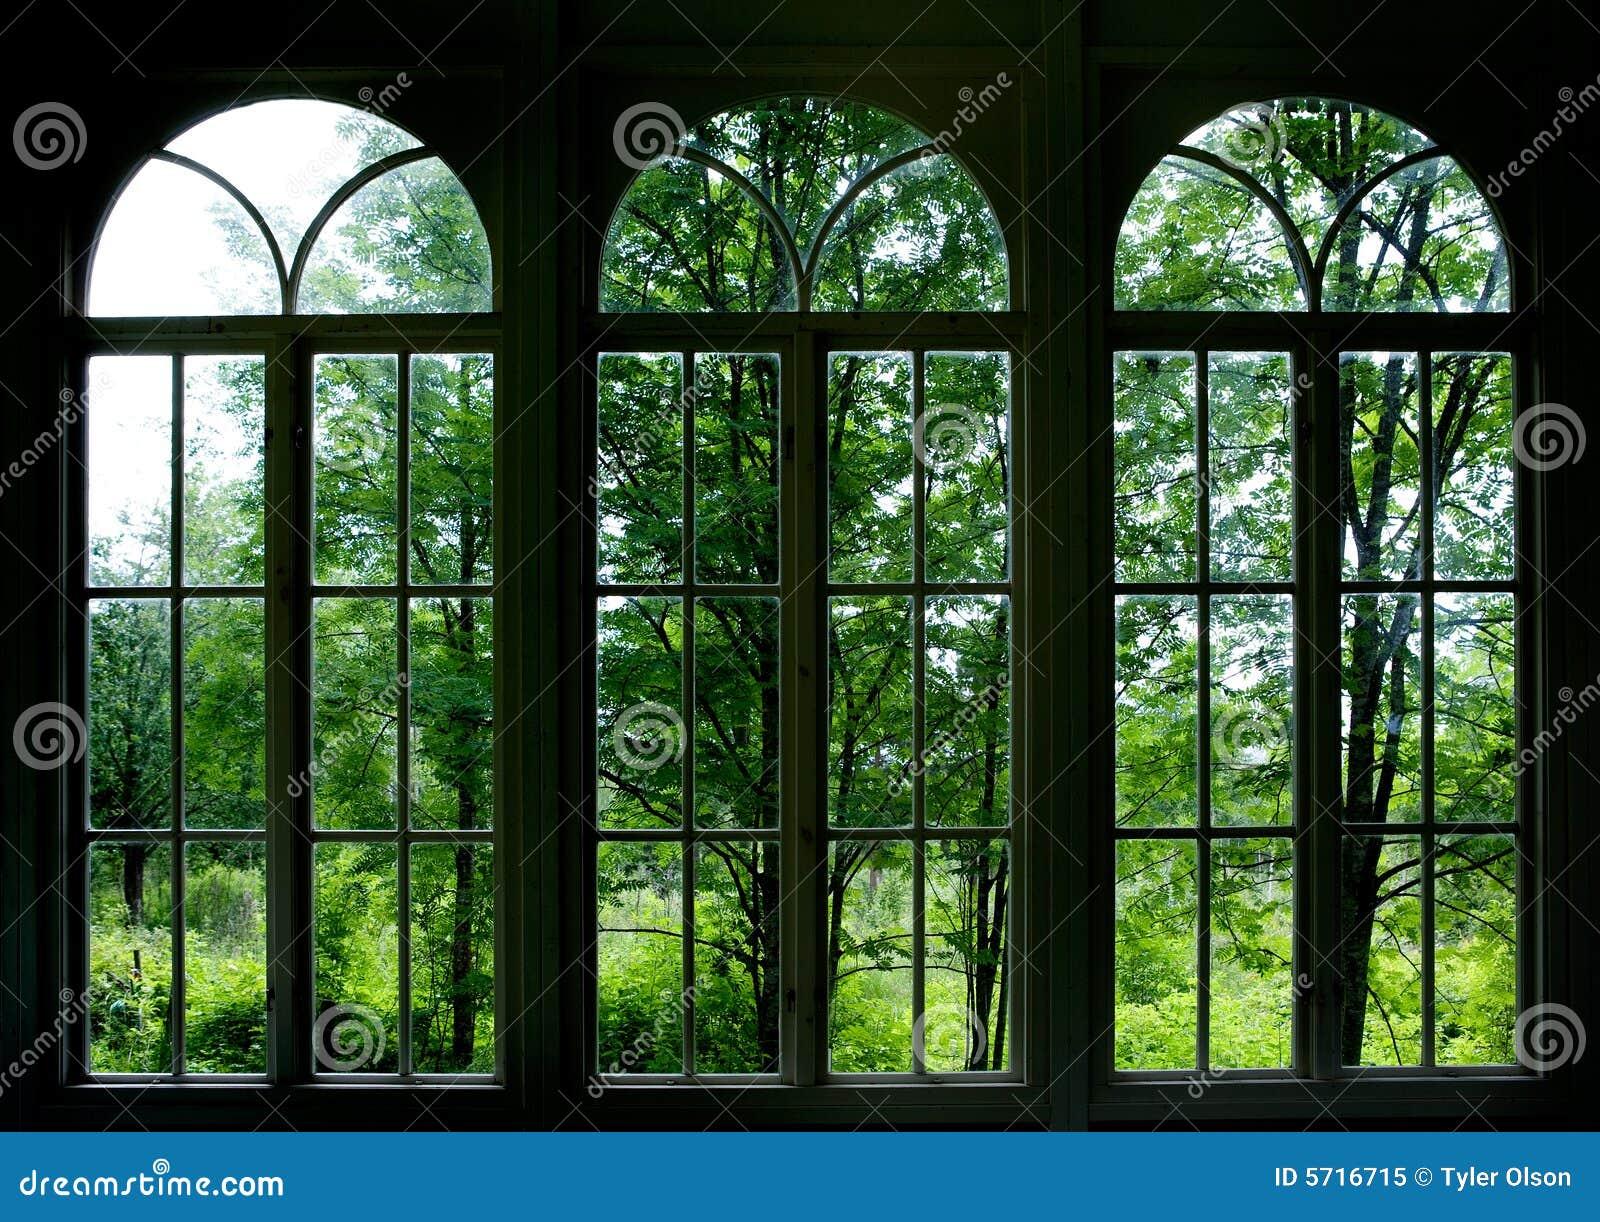 Ventana del jardín imagen de archivo. Imagen de ventana - 5716715